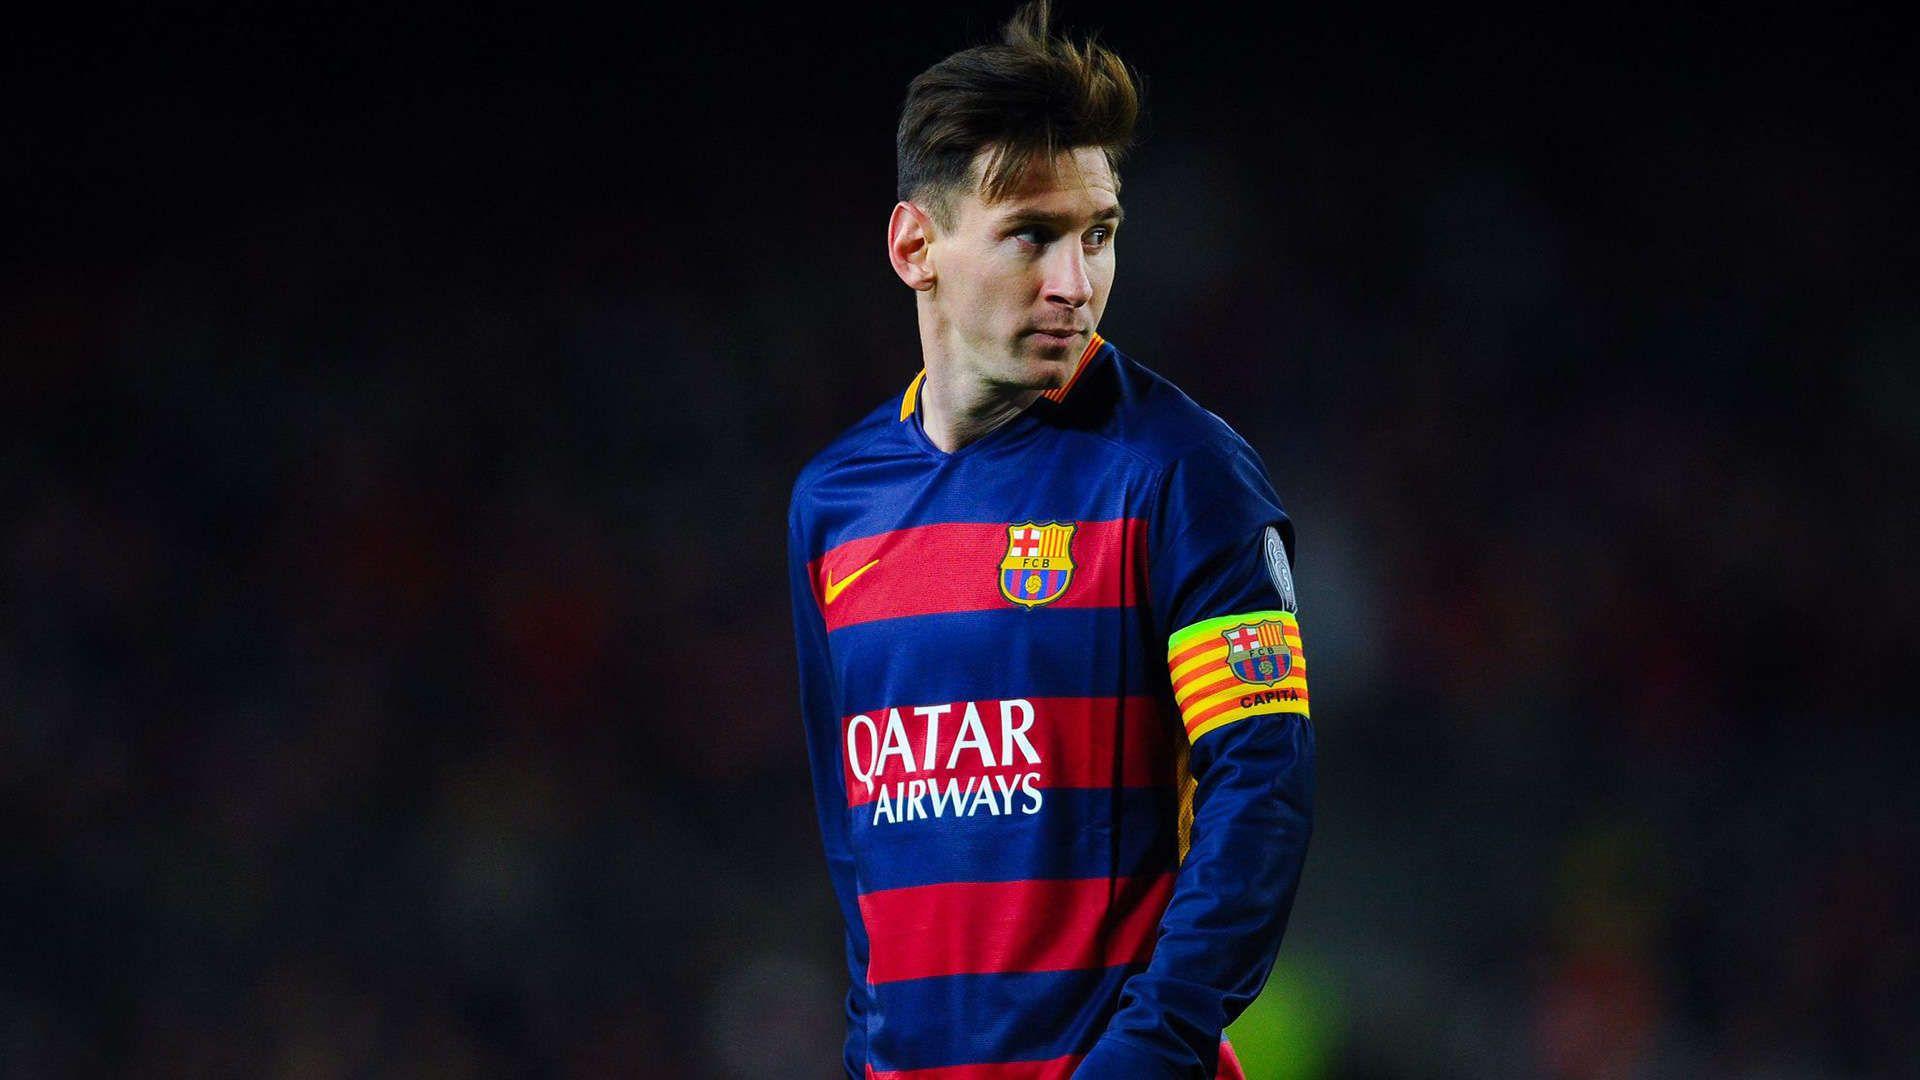 Lionel Messi Wallpaper HD Soccer Desktop